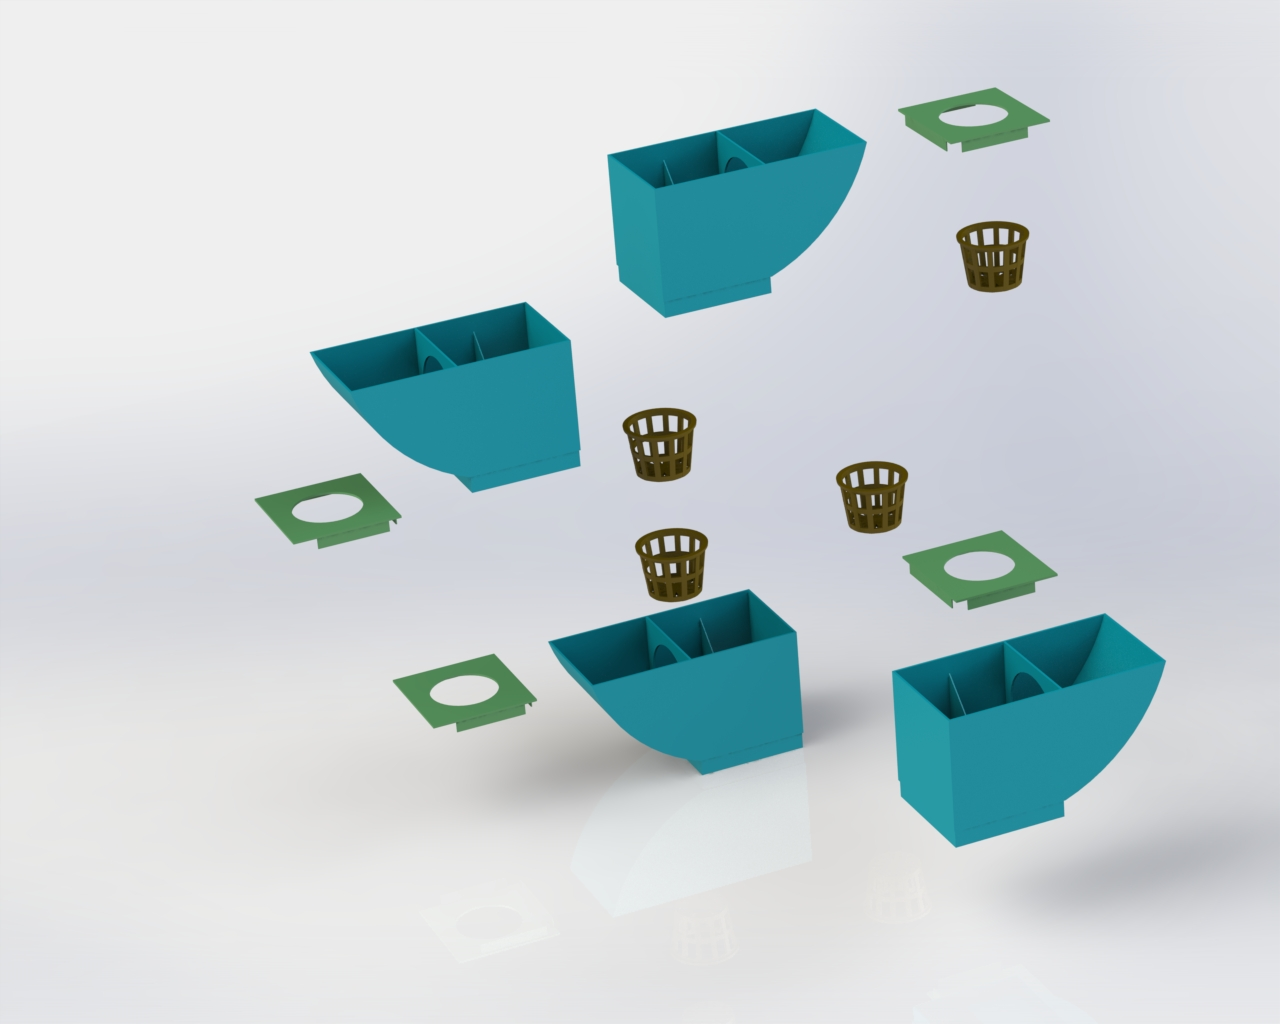 Modular Hydroponics System for Legal Cannabis Cultivation